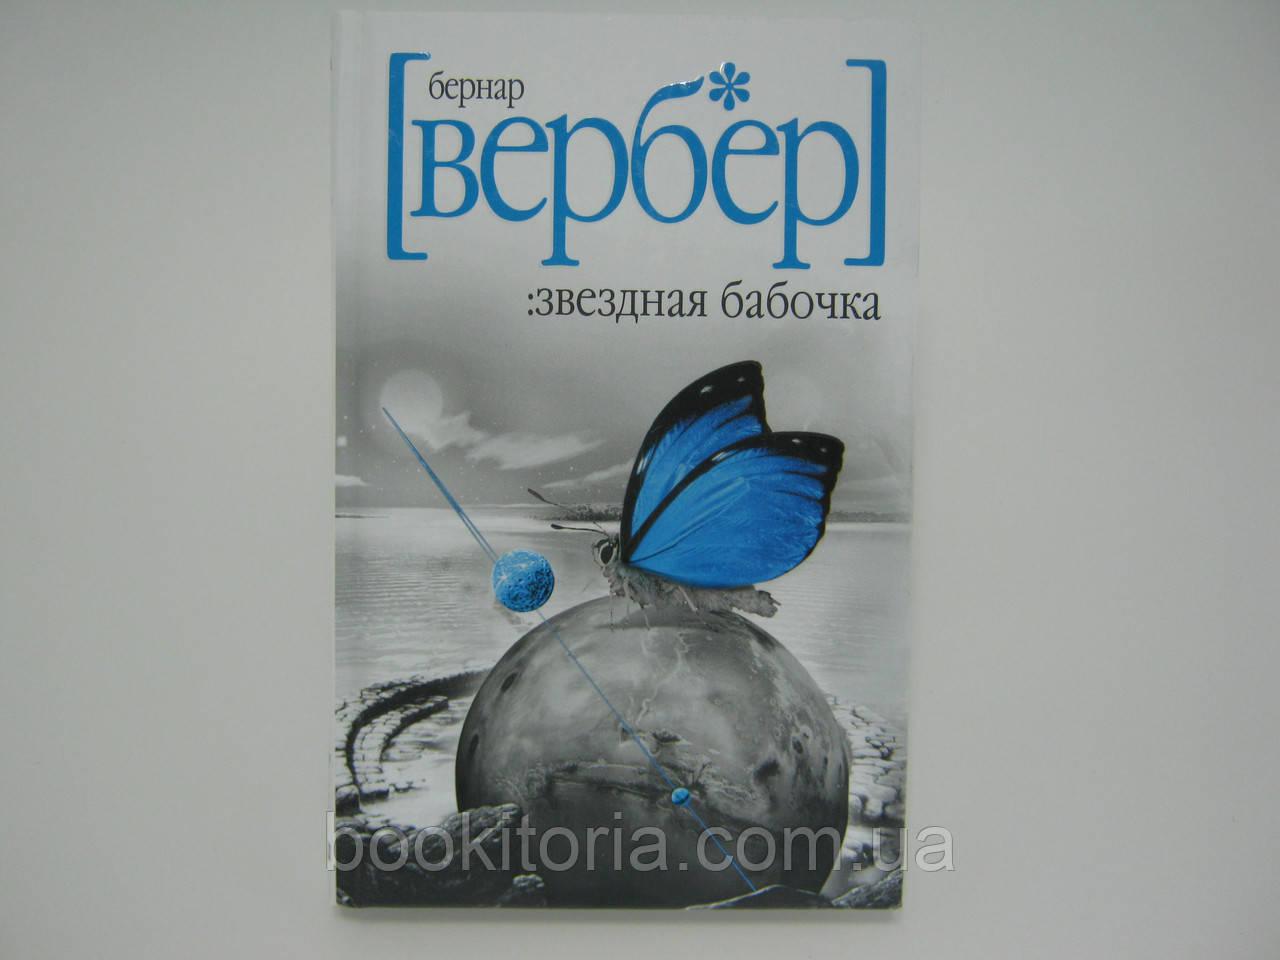 Вербер Б. Звёздная бабочка.